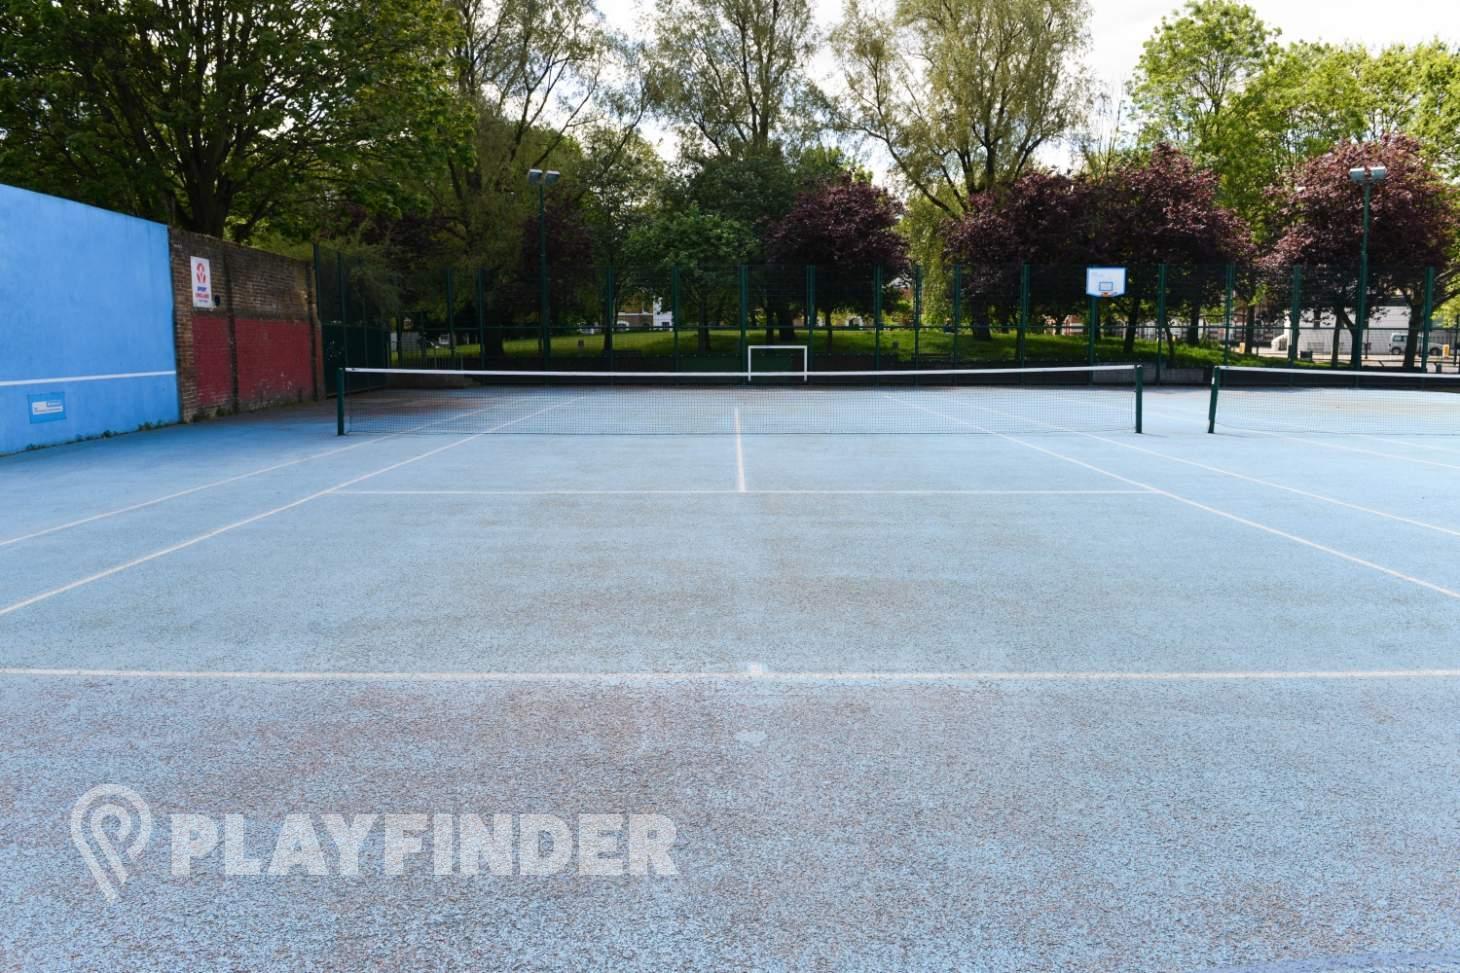 Rosemary Gardens Outdoor | Hard (macadam) tennis court